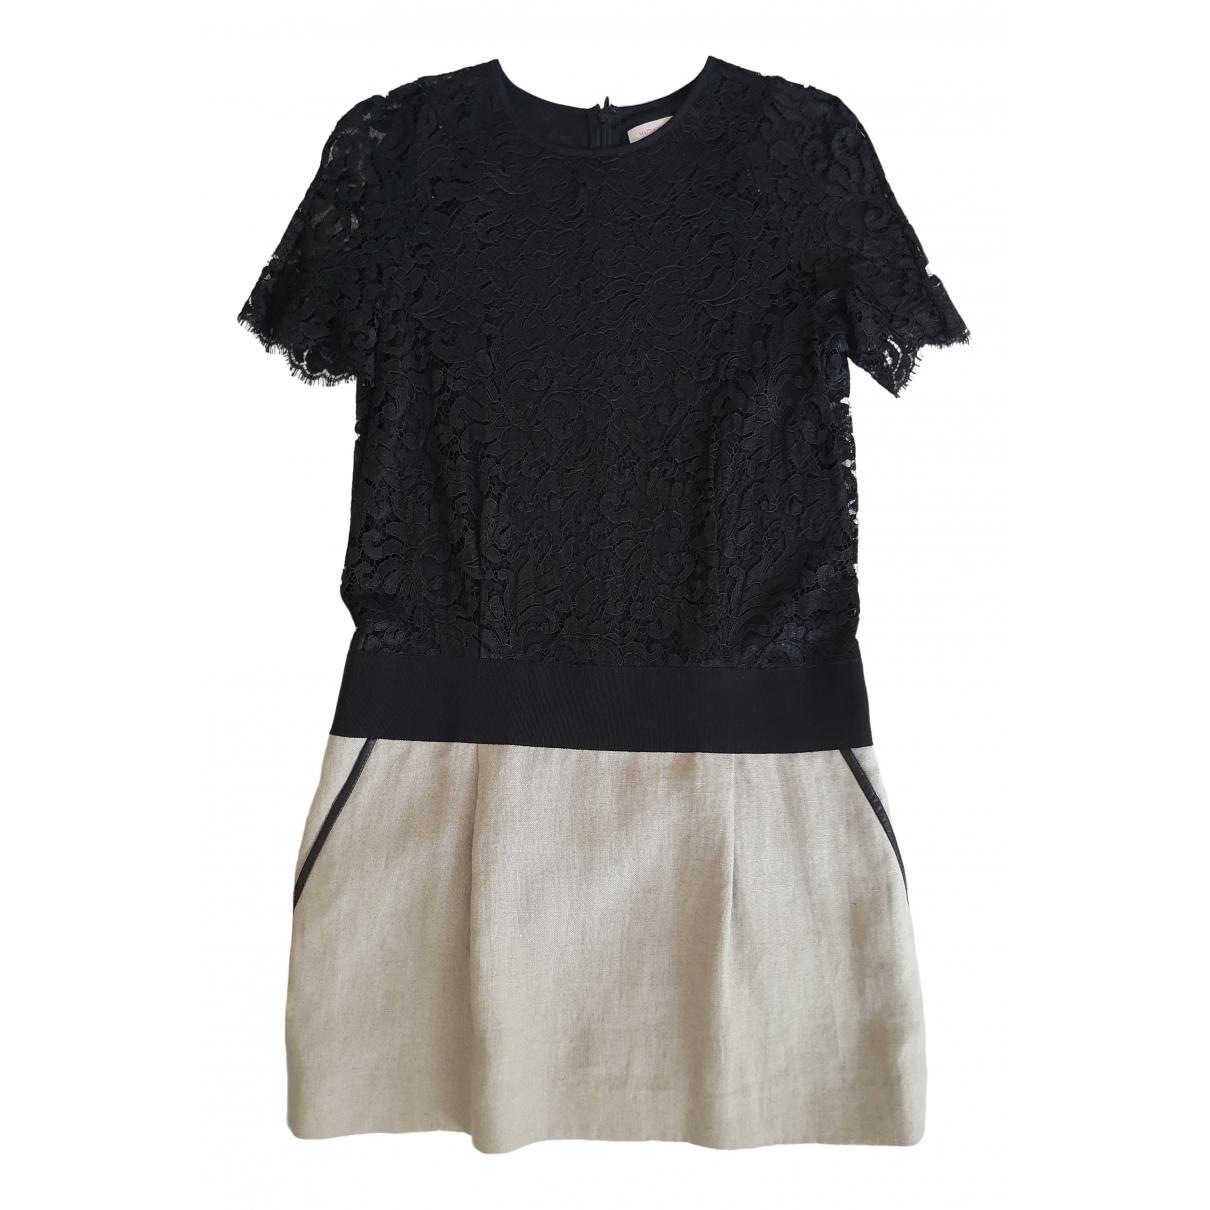 Matthew Williamson \N Black dress for Women 8 UK